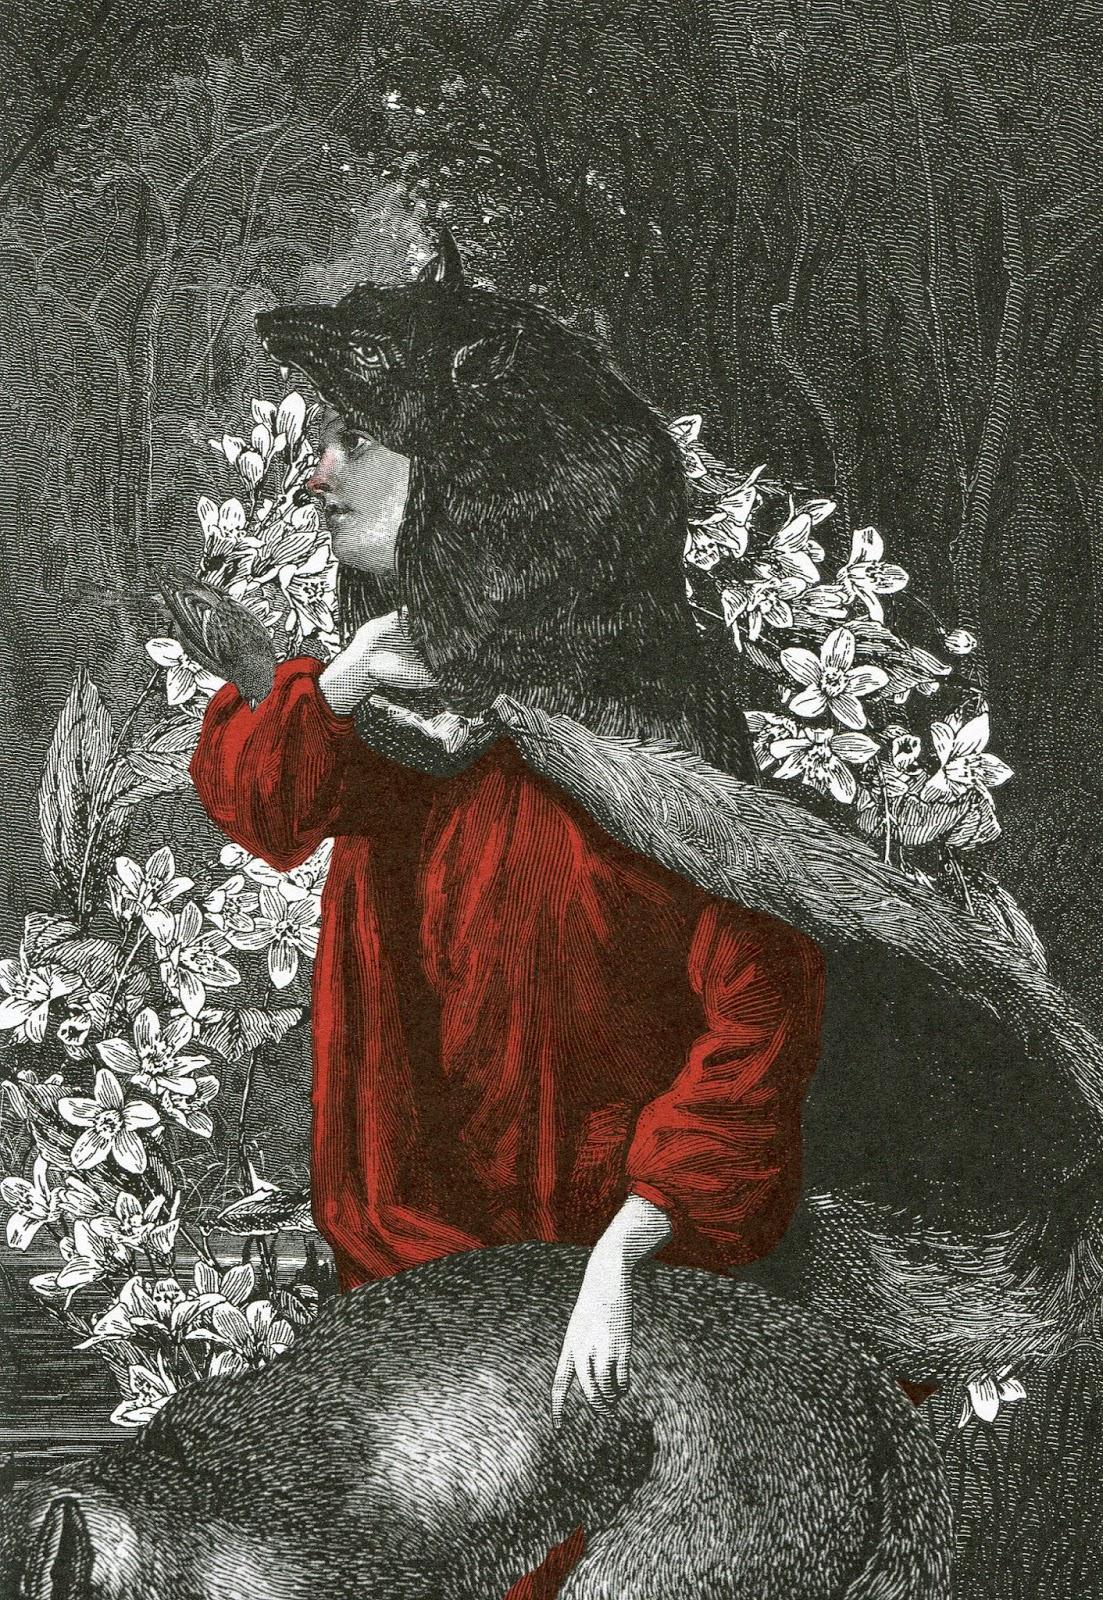 La-camara-sangrienta-ilustracion